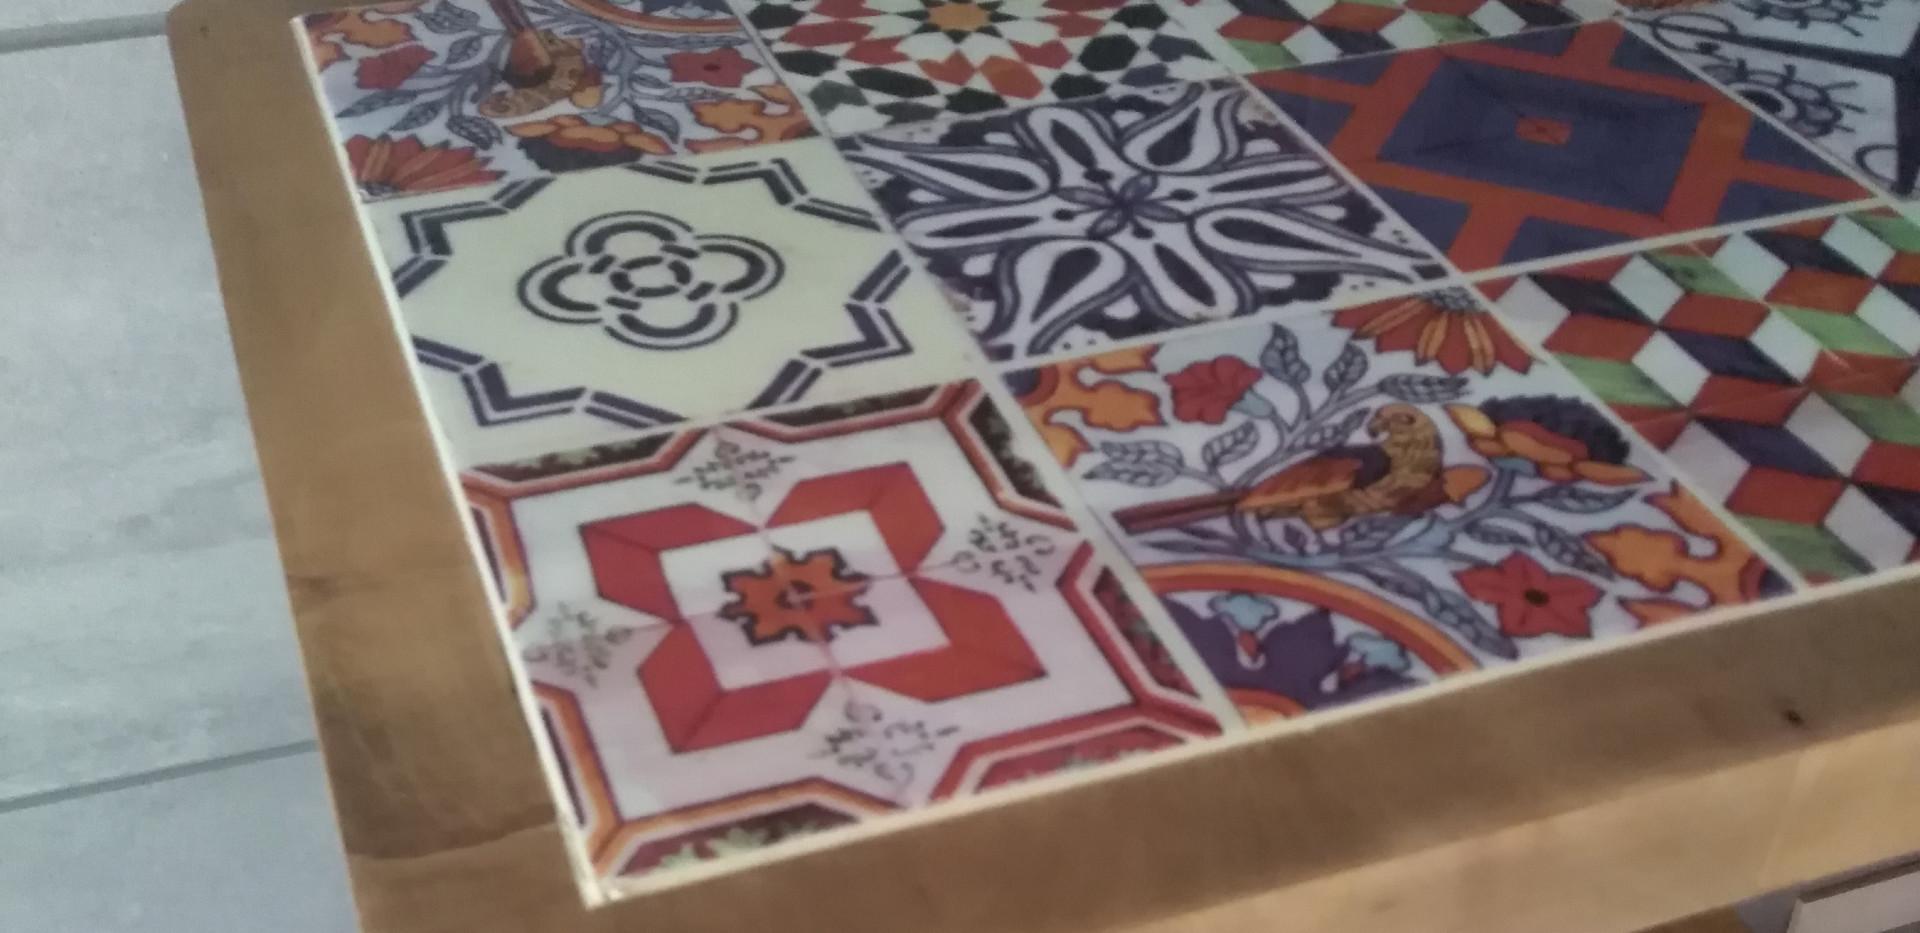 Stolik Maroco_1